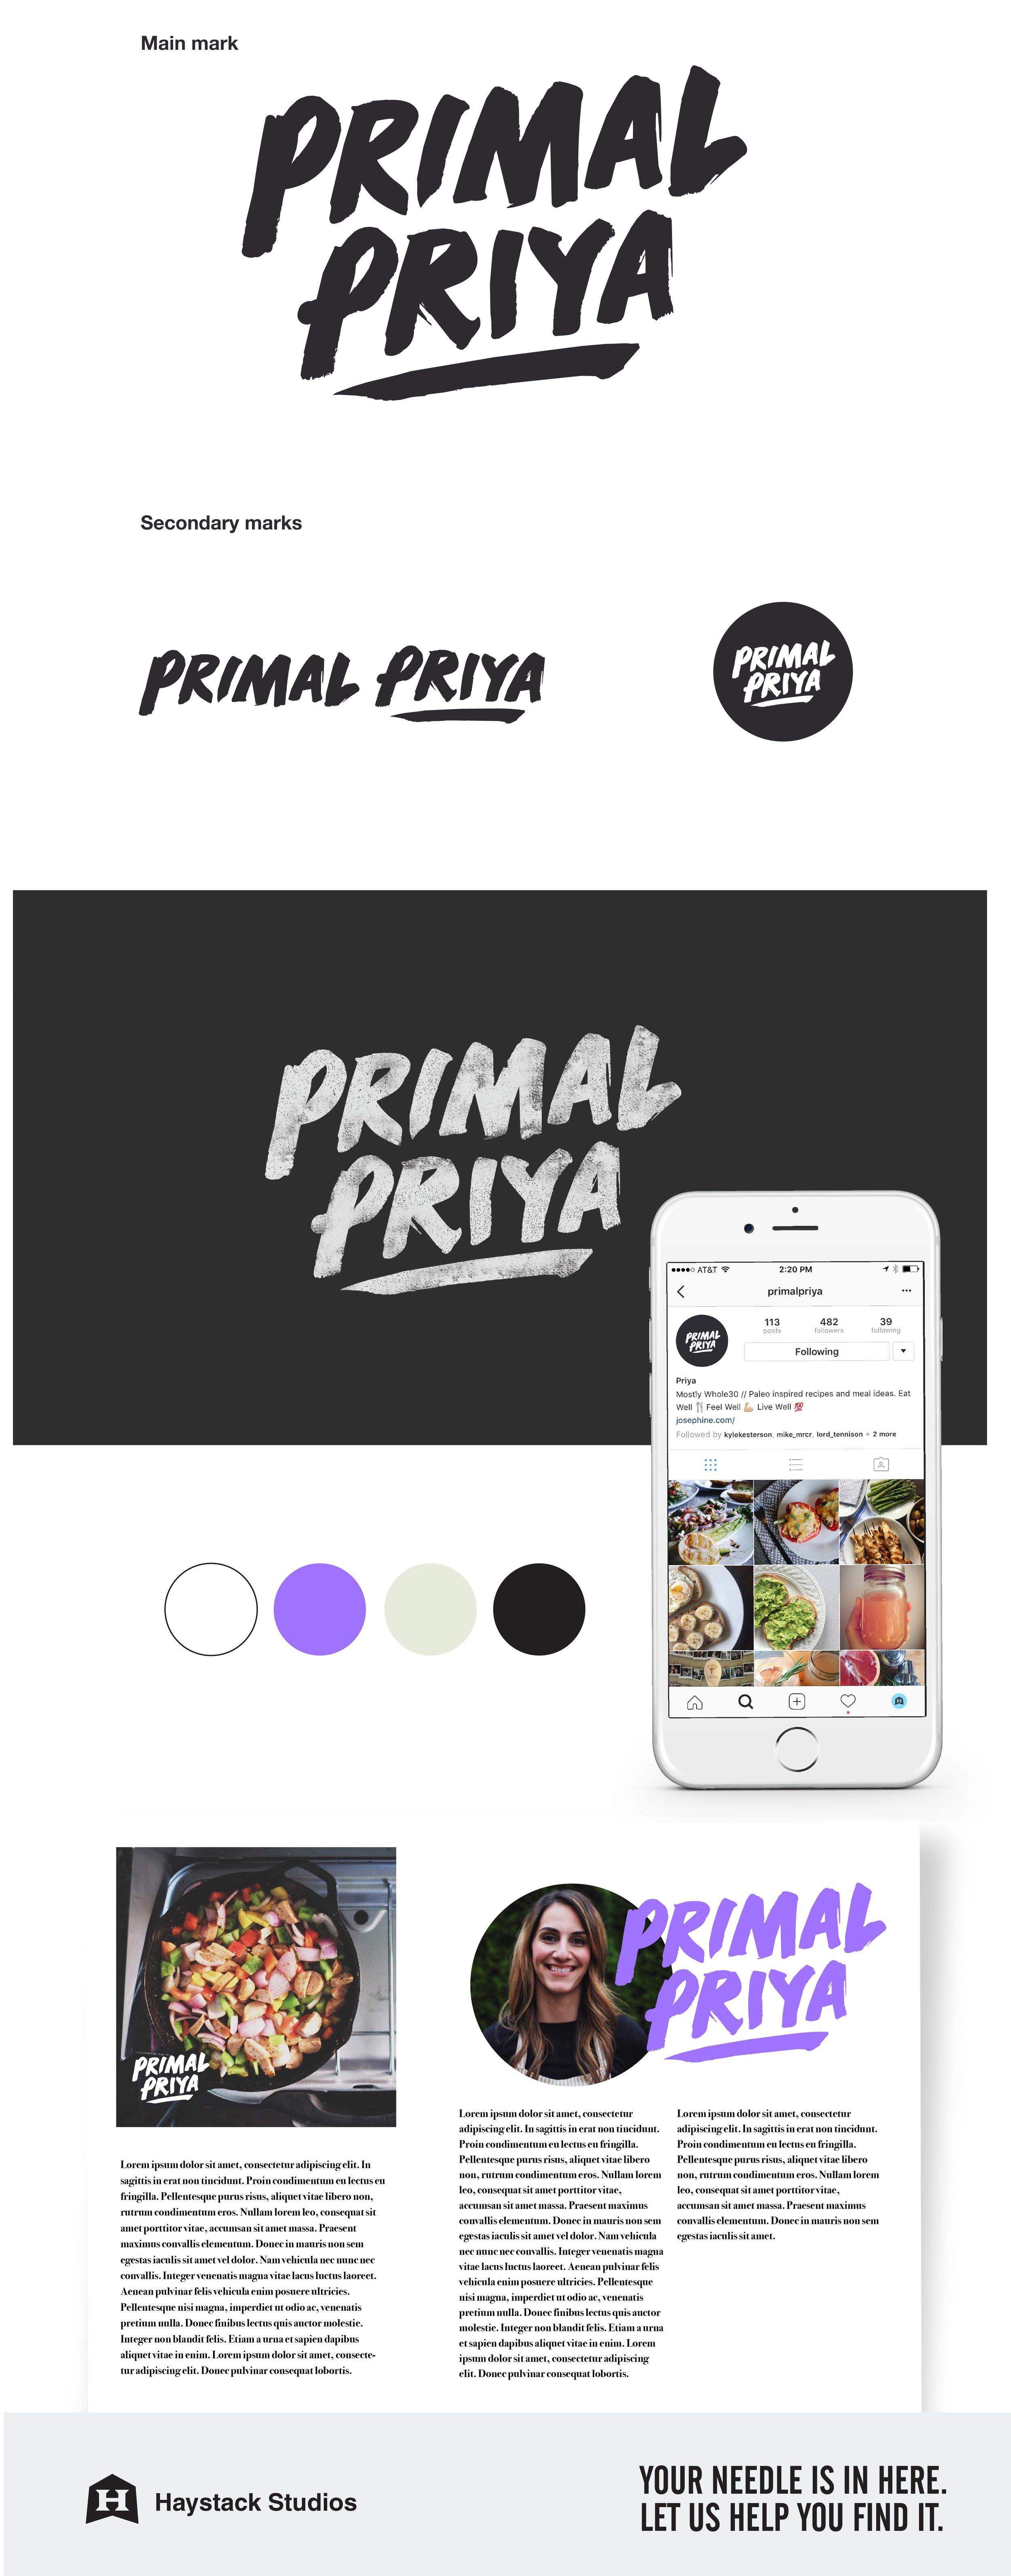 PrimalPriya_casestudy_mt-15.jpg